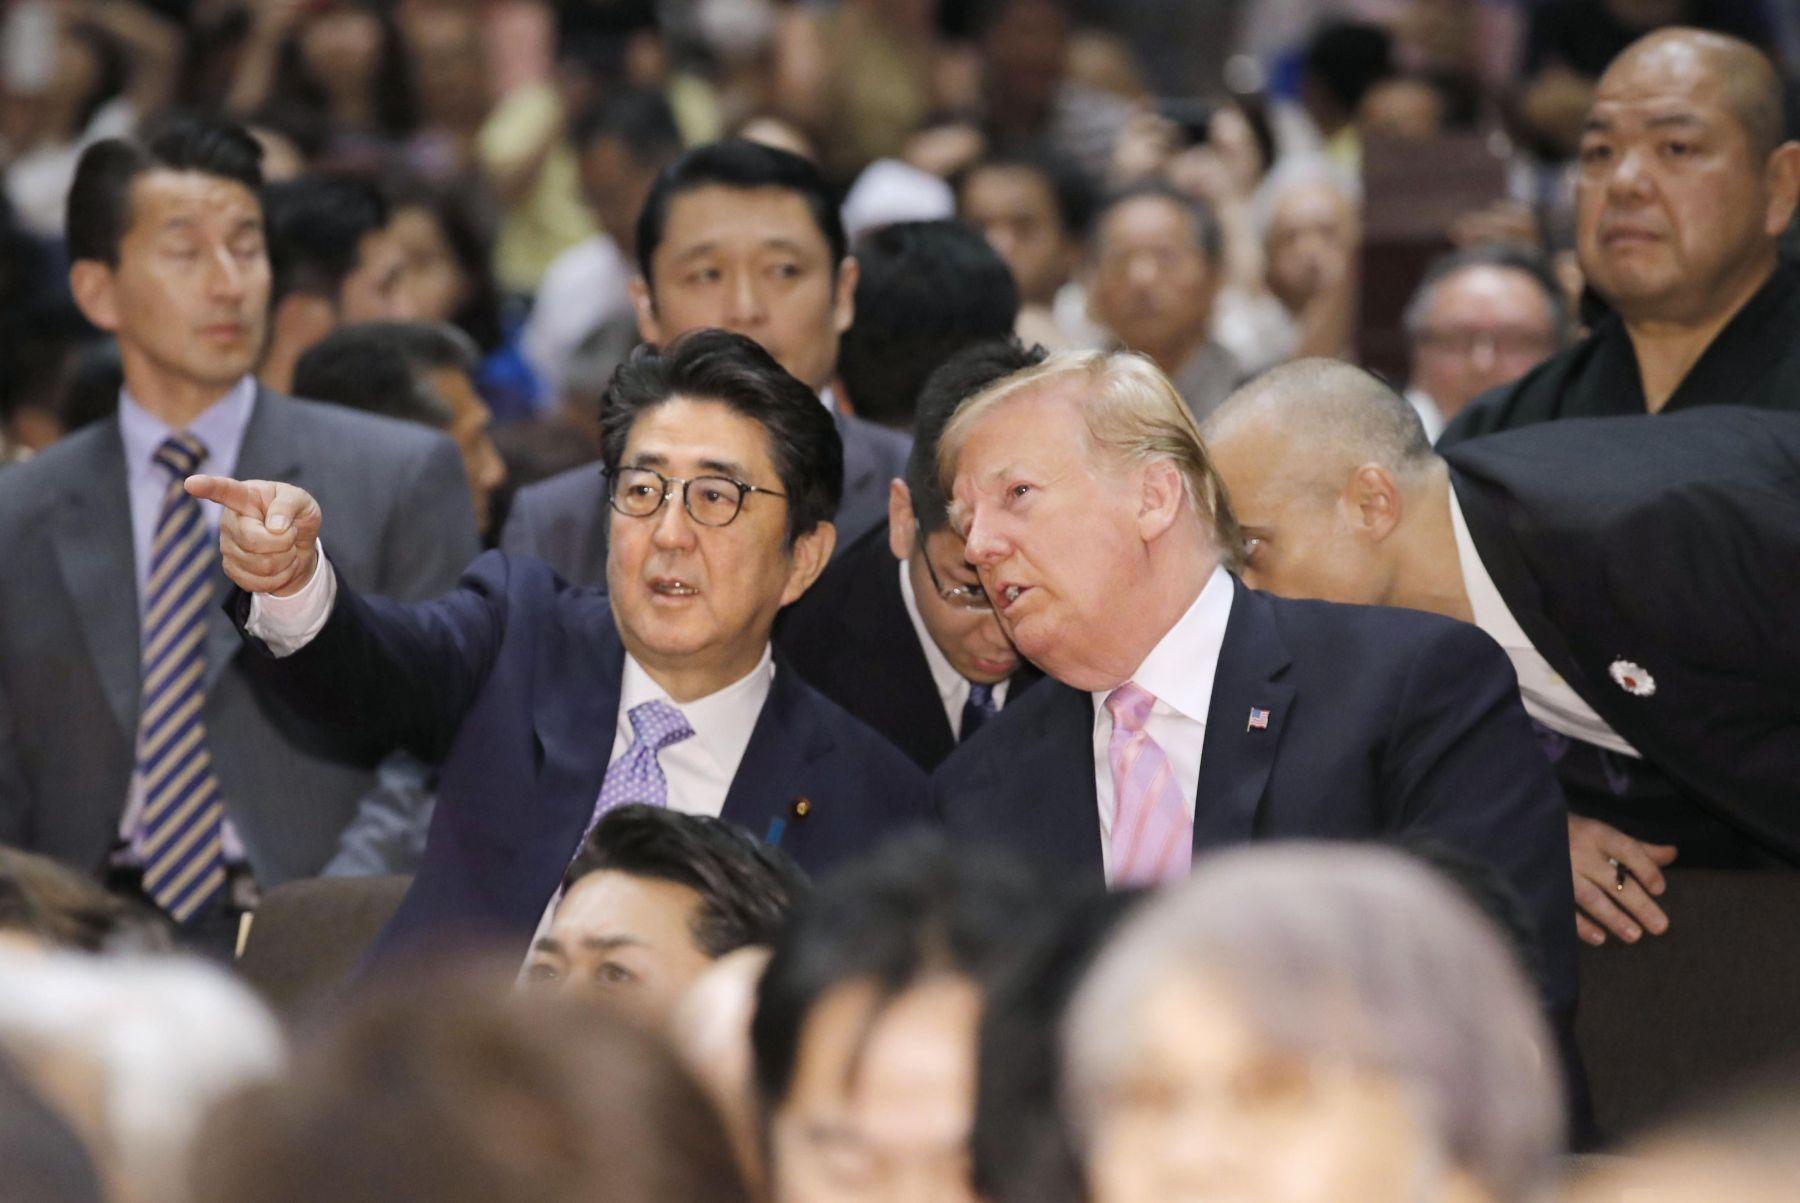 President Trump U.S. Cup to Japan Sumo Wrestler 008